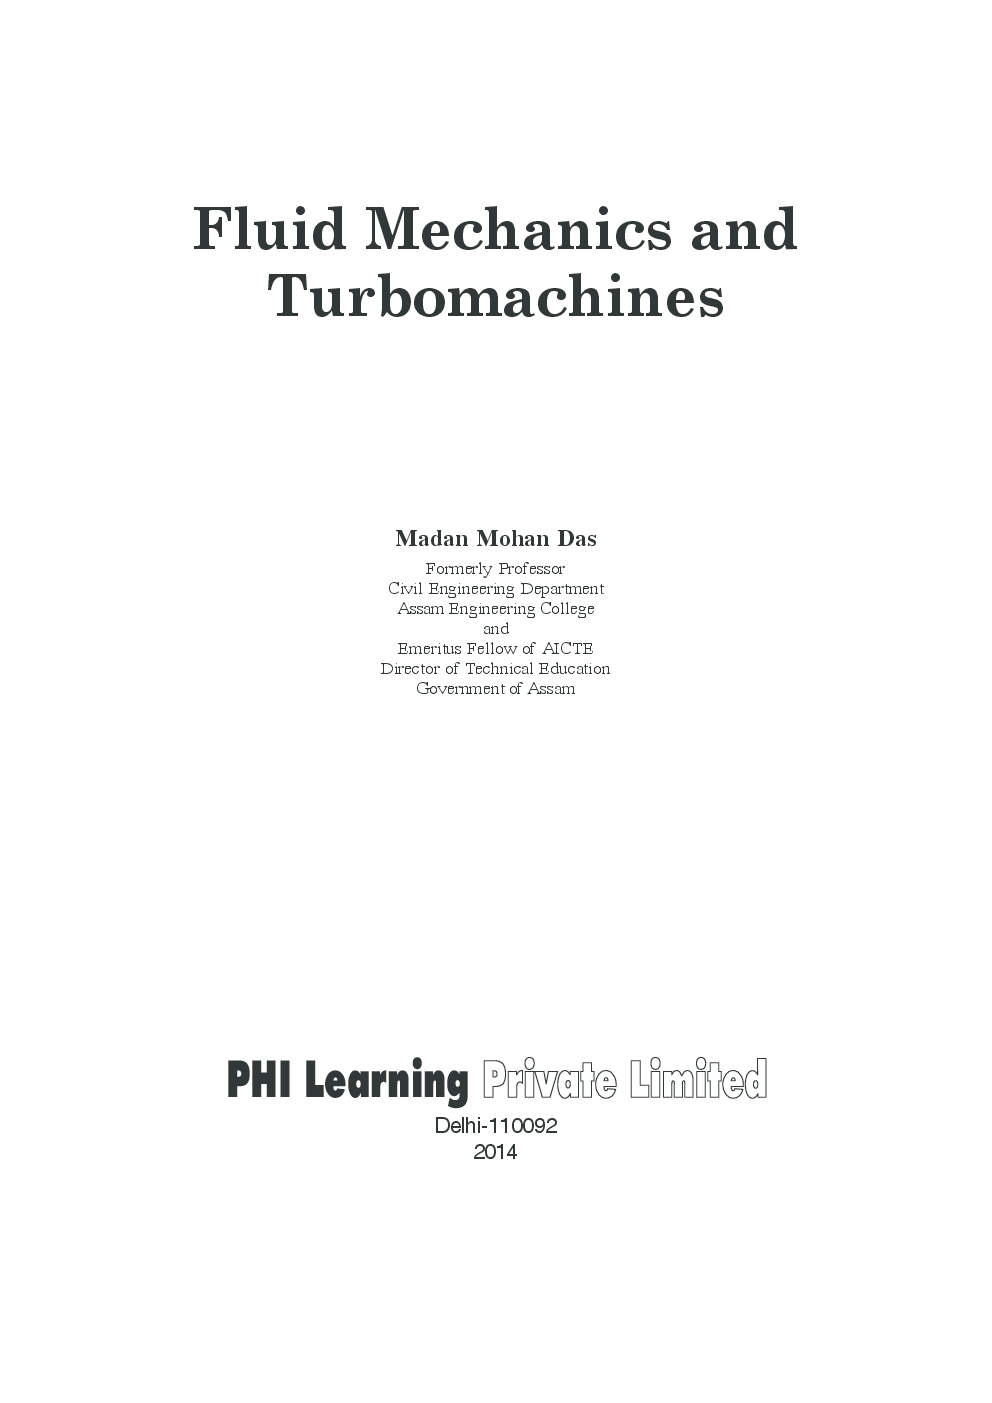 Fluid Mechanics And Turbomachines - Page 2